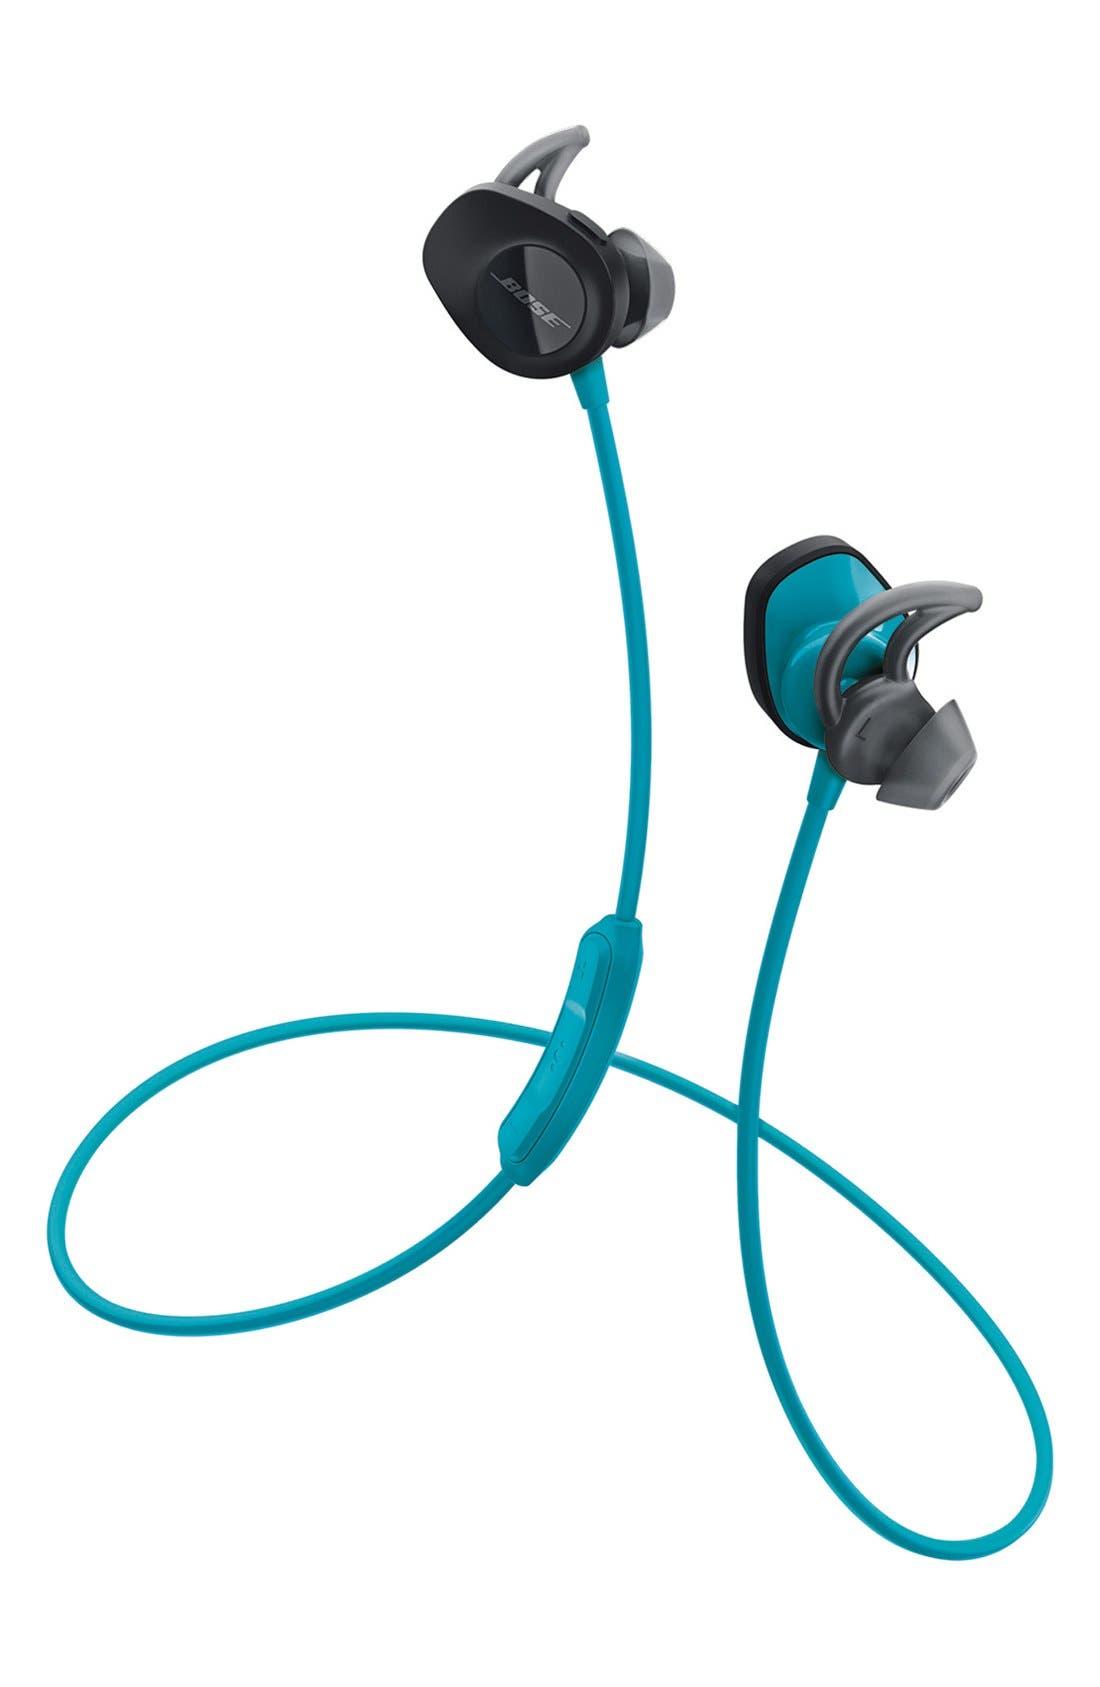 Main Image - Bose® SoundSport® In-Ear Bluetooth® Headphones